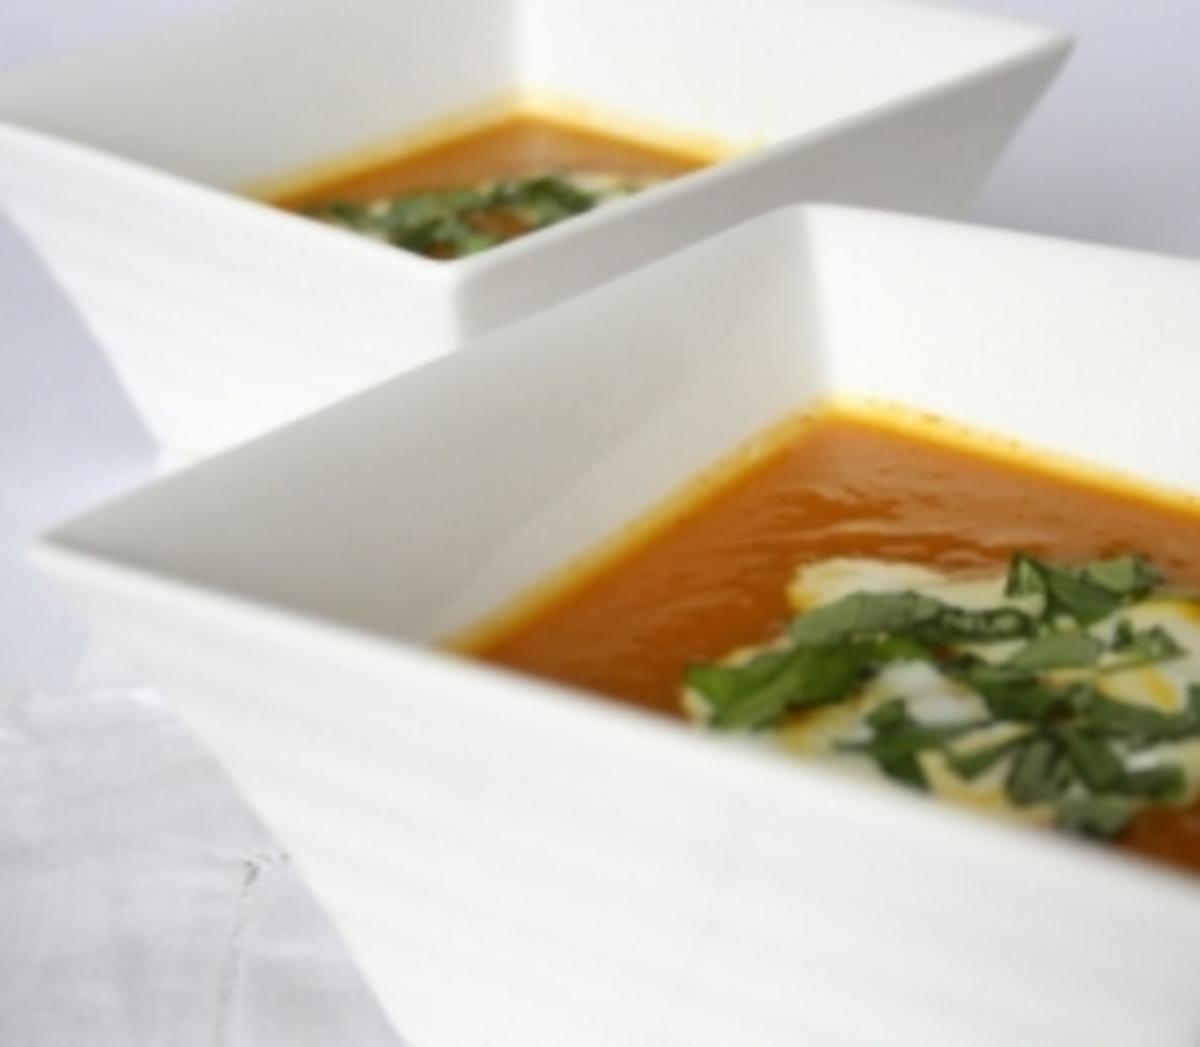 Karottencremesuppe mit Plup - Rezept By enaspice